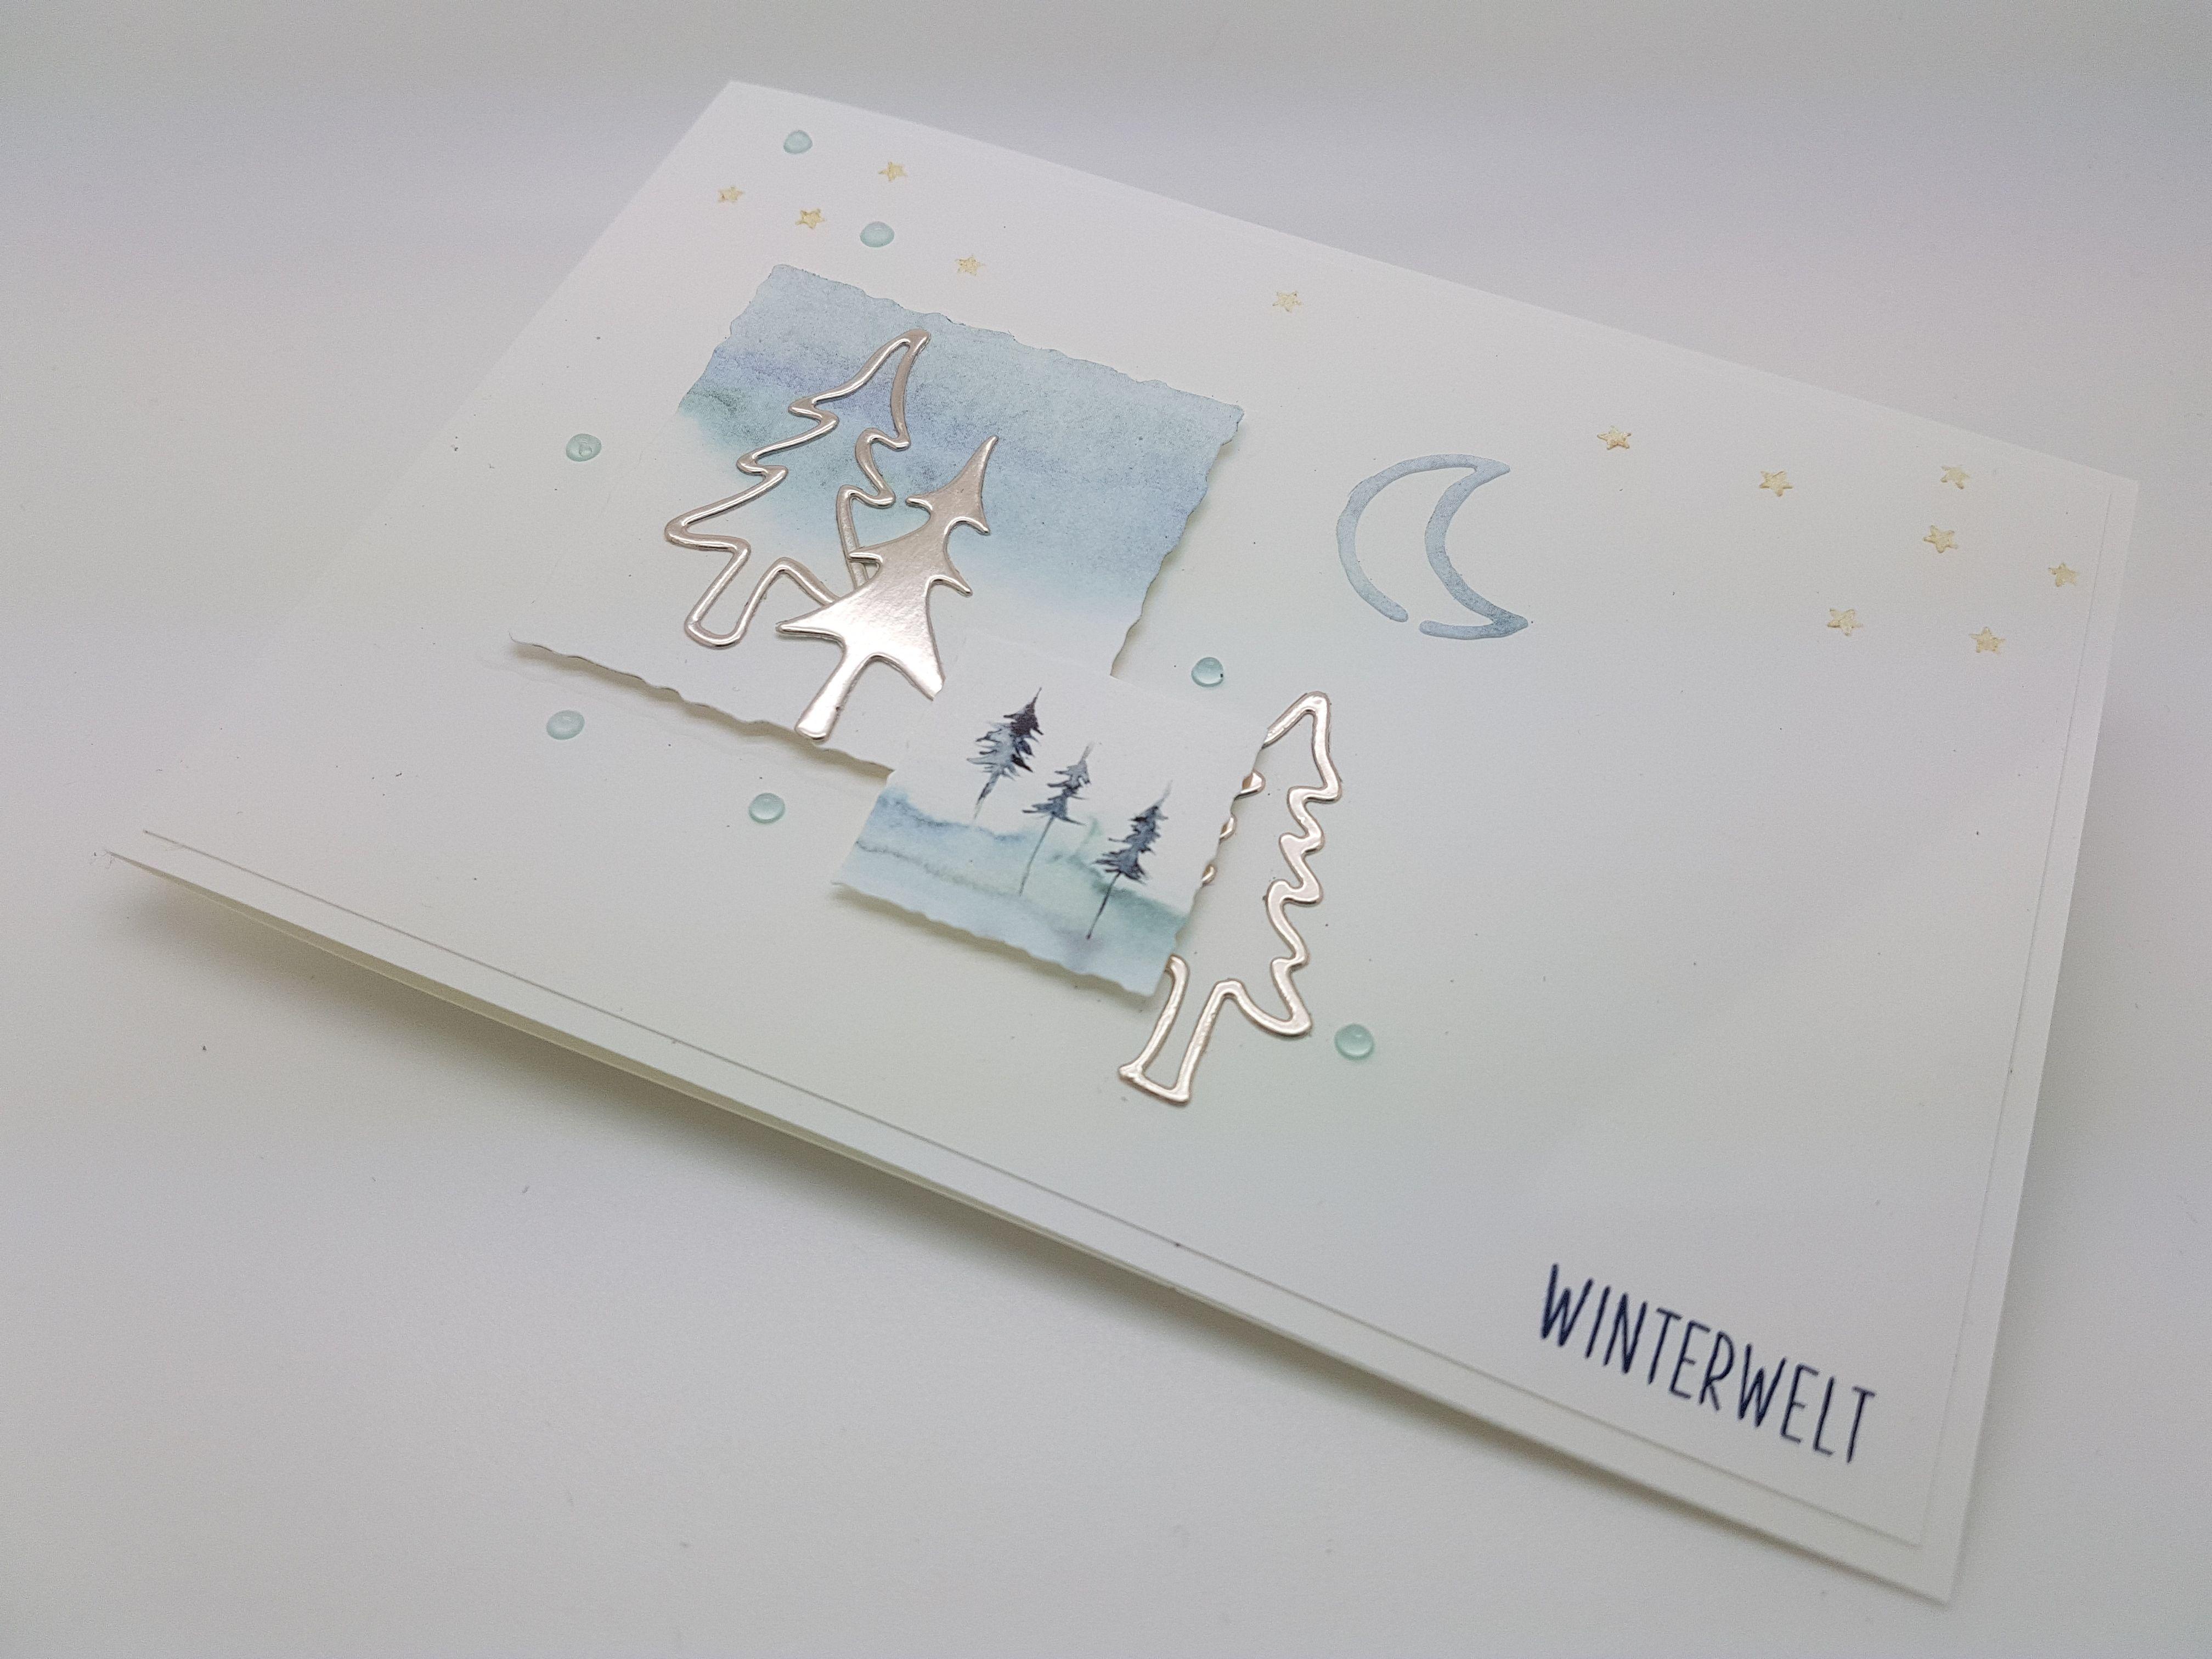 paperinmotion - creative design with paper, stamp and punch - #creative #design #Paper #paperinmotion #punch #stamp #bonpourcalendrierdelavent